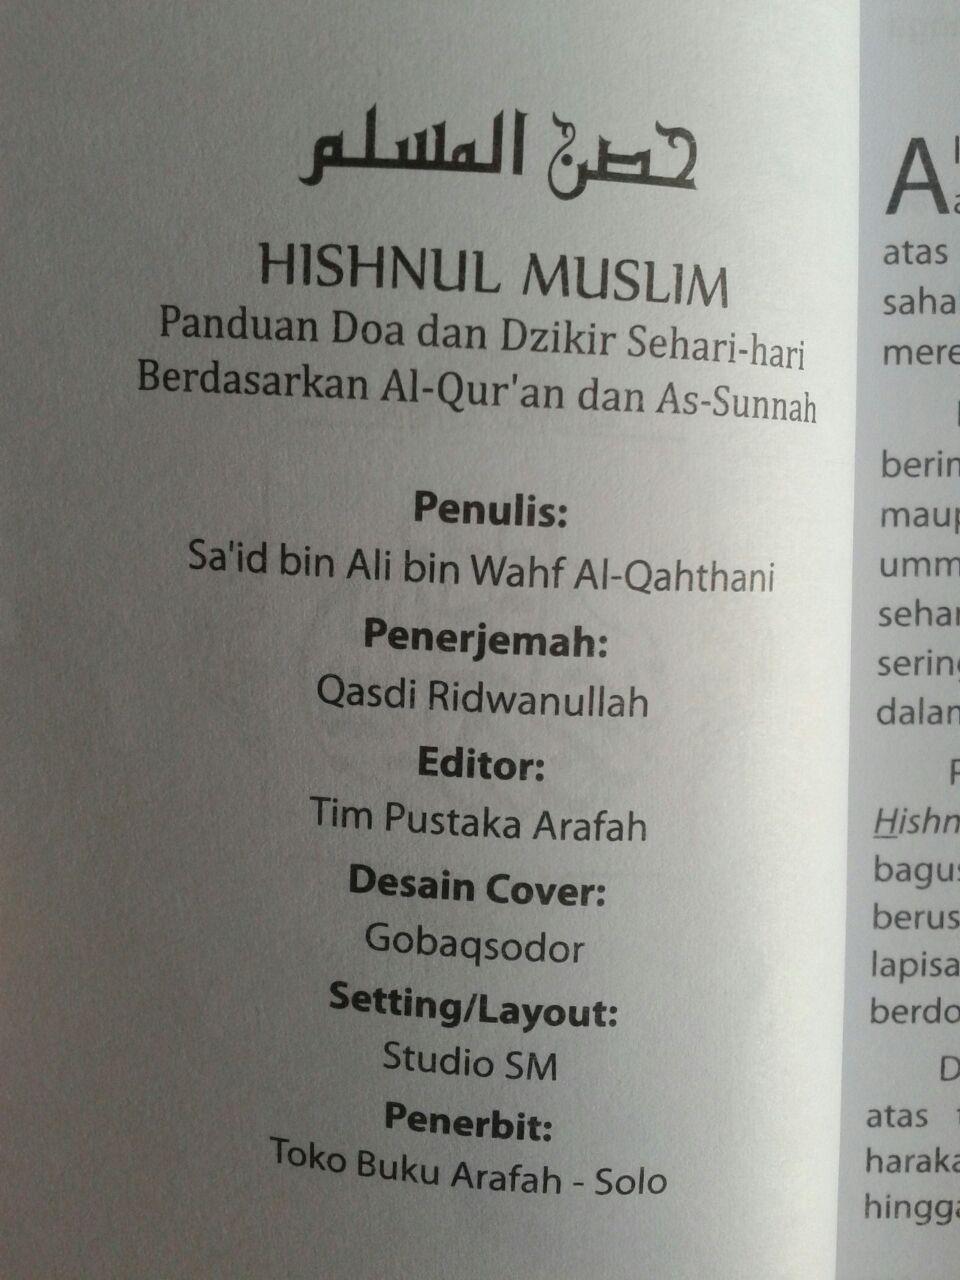 Buku Saku Hishnul Muslim Panduan Doa Dan Dzikir Sehari Hari isi 3